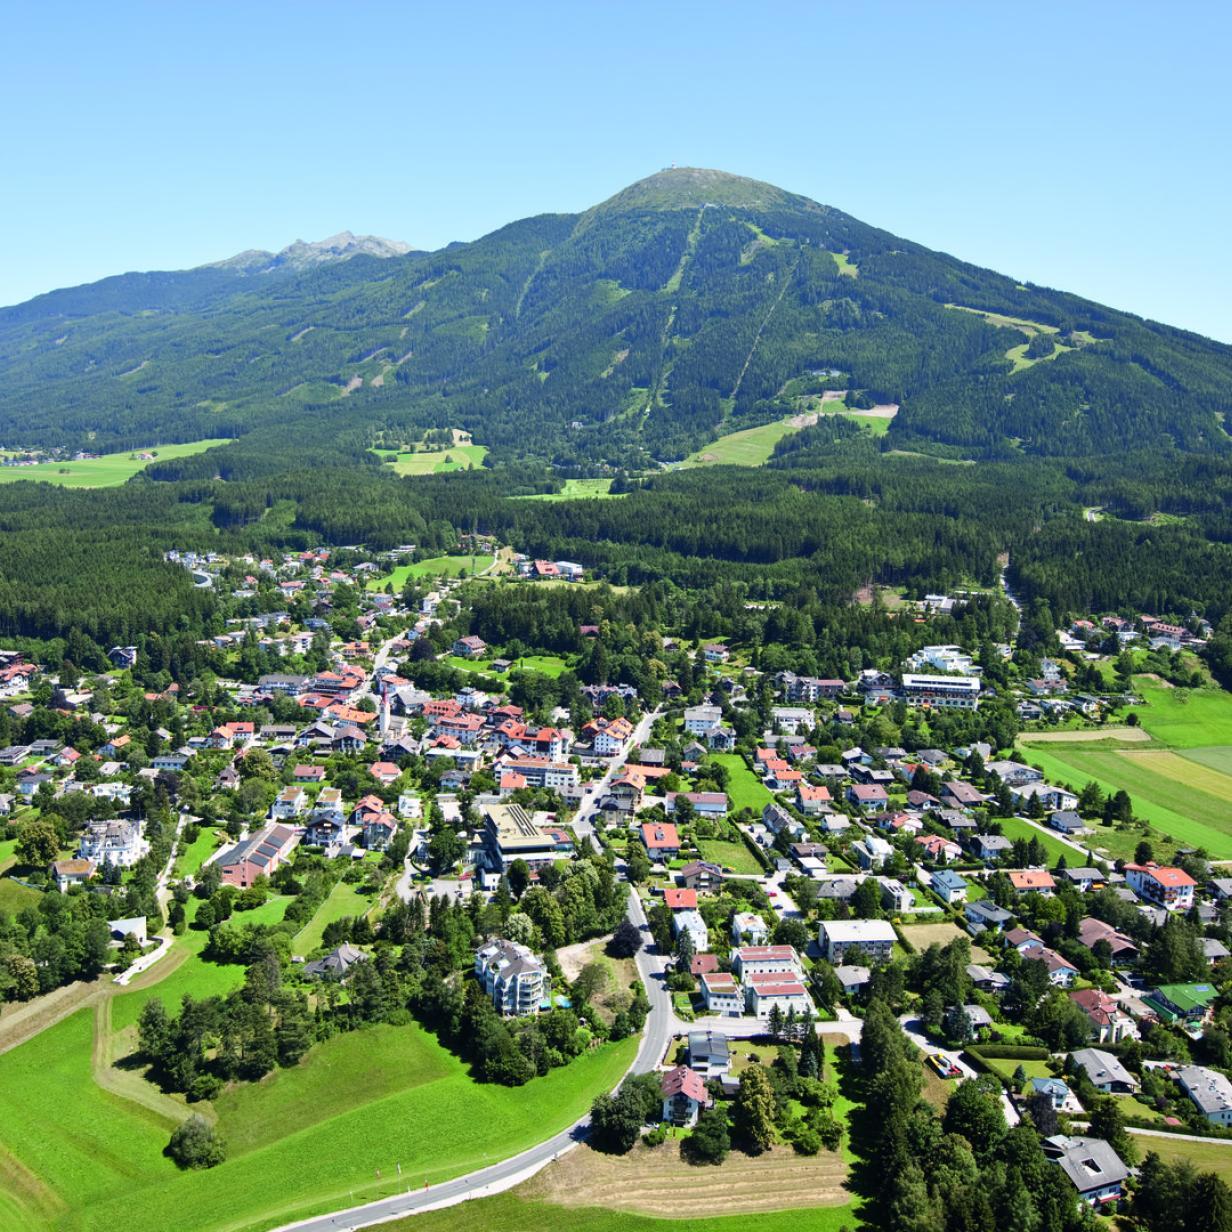 Singles Innsbruck-Igls, Kontaktanzeigen aus Innsbruck-Igls